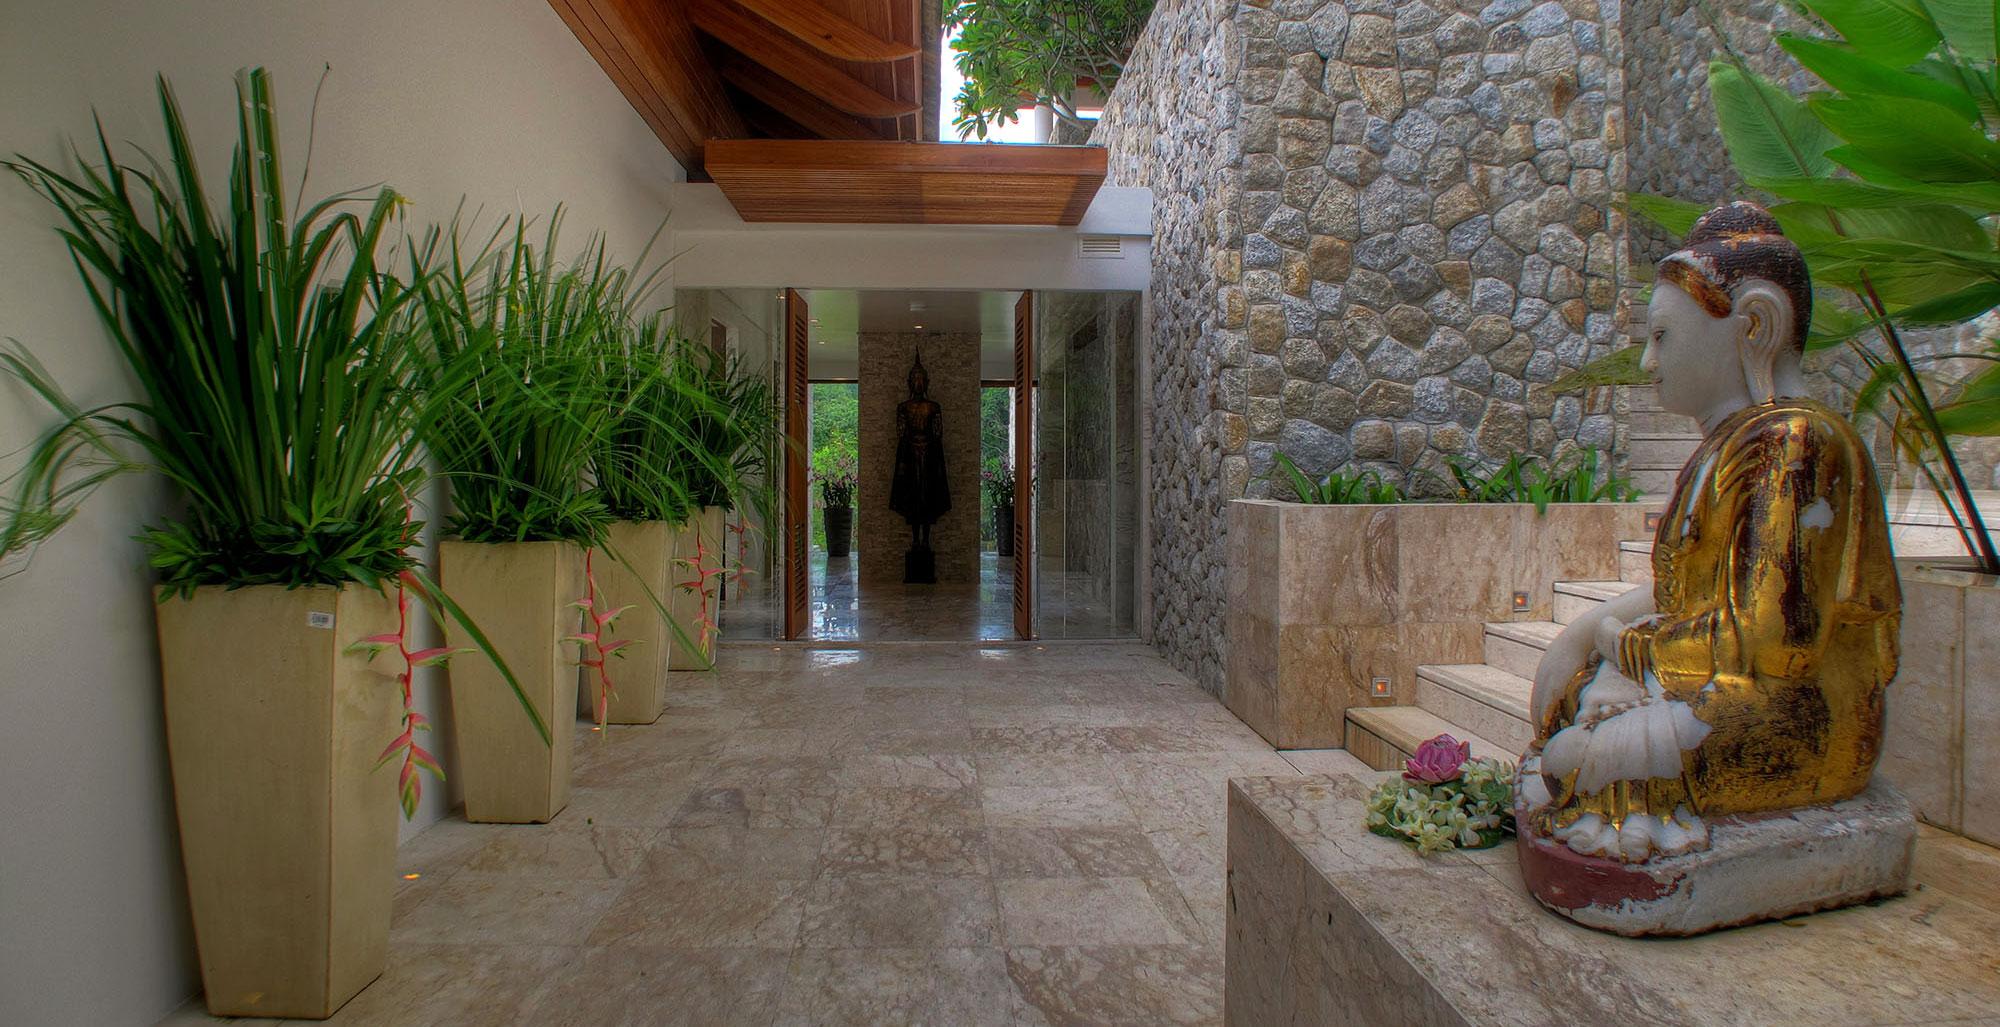 Villa Minh - Grand entrance